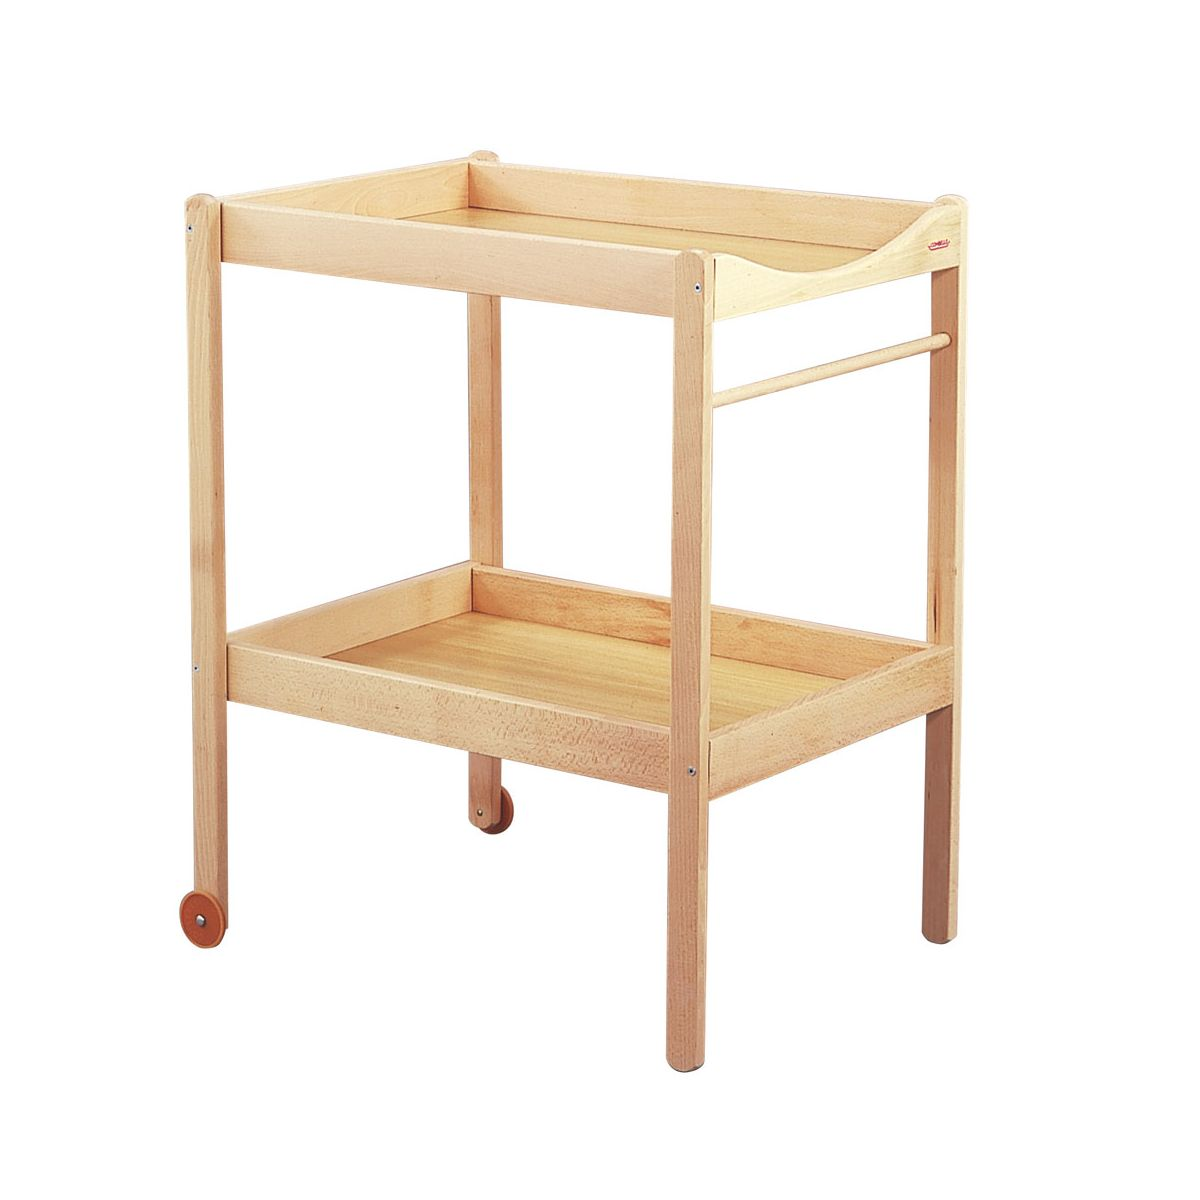 luiertafel alice natuurlijk vernis sebio. Black Bedroom Furniture Sets. Home Design Ideas